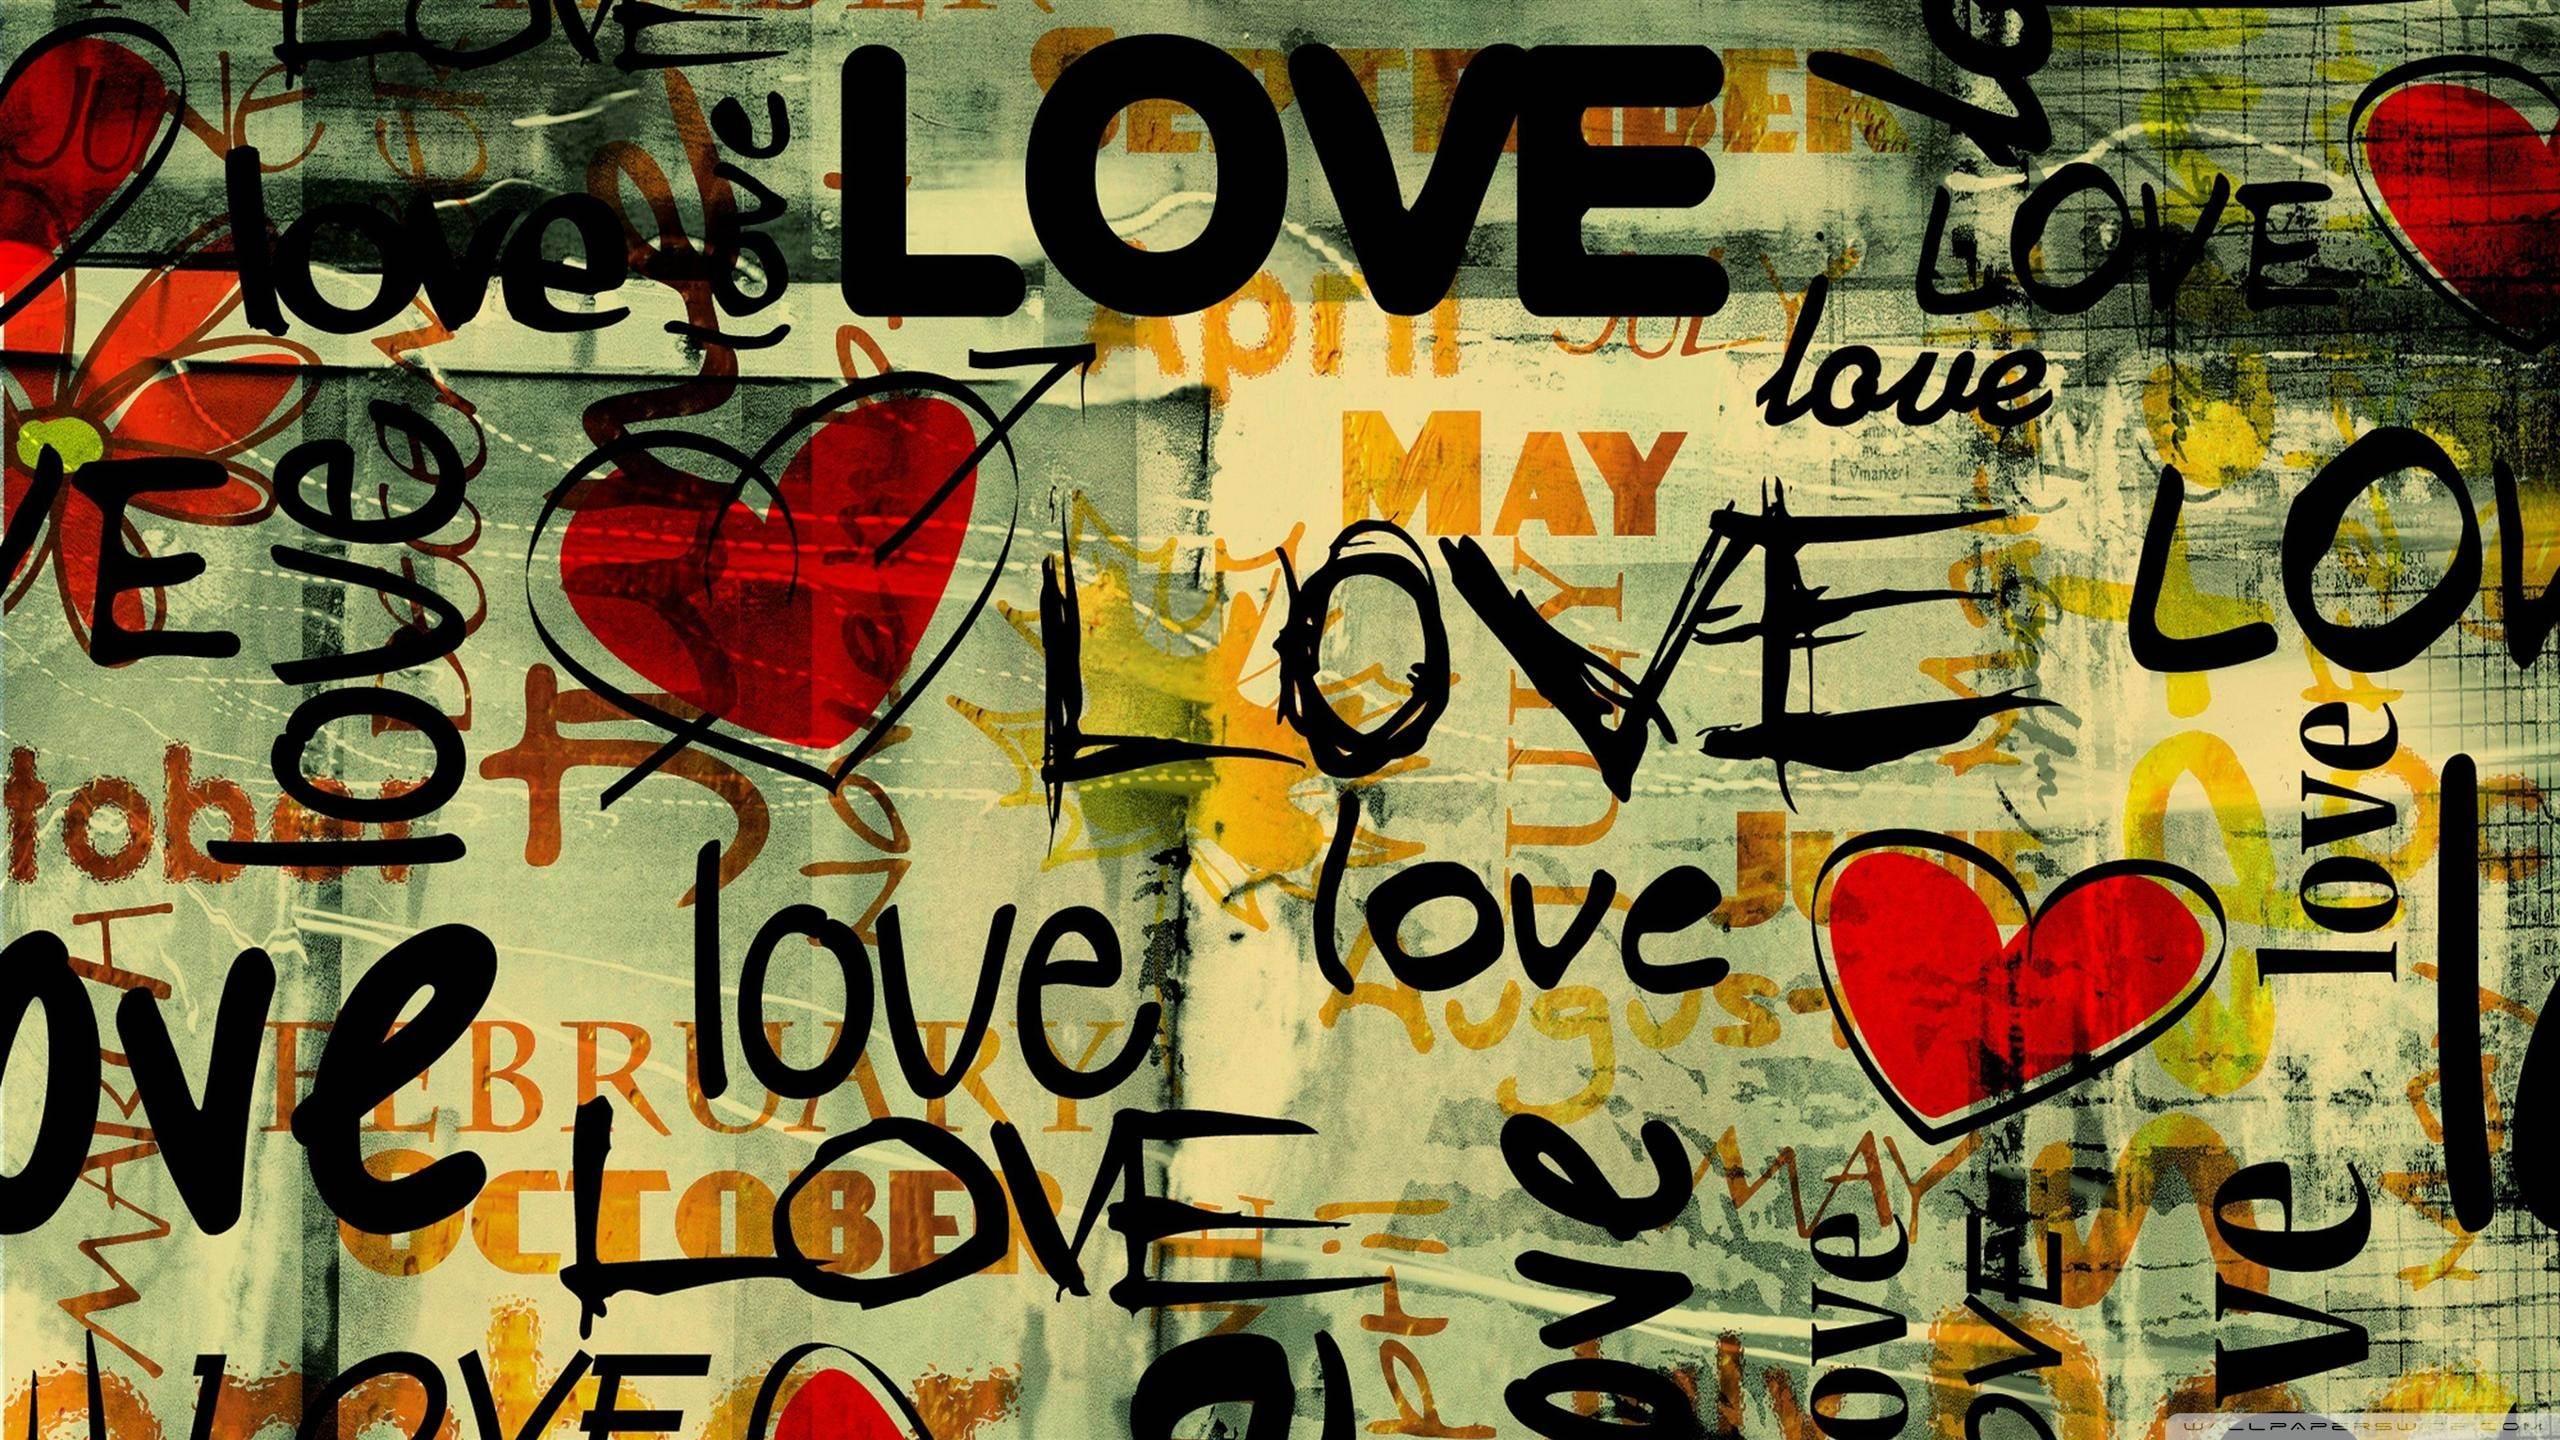 D Love Couple Cartoon Wallpapers Download D Wallpaper Hd 2560x1440